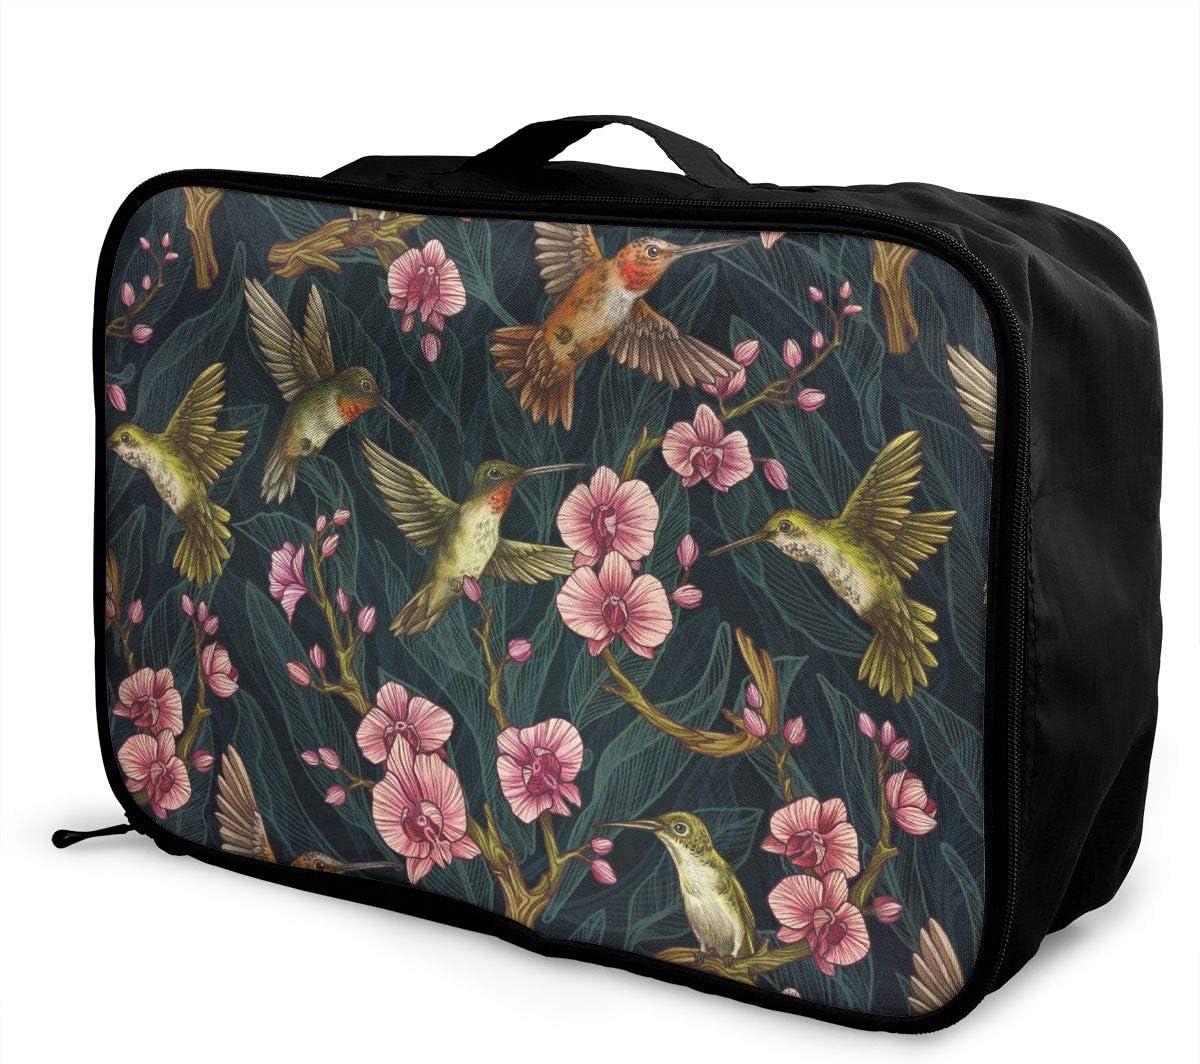 Lightweight Large Capacity Duffel Portable Luggage Bag Hot Air Balloon Sky Cartoon Travel Waterproof Foldable Storage Carry Tote Bag